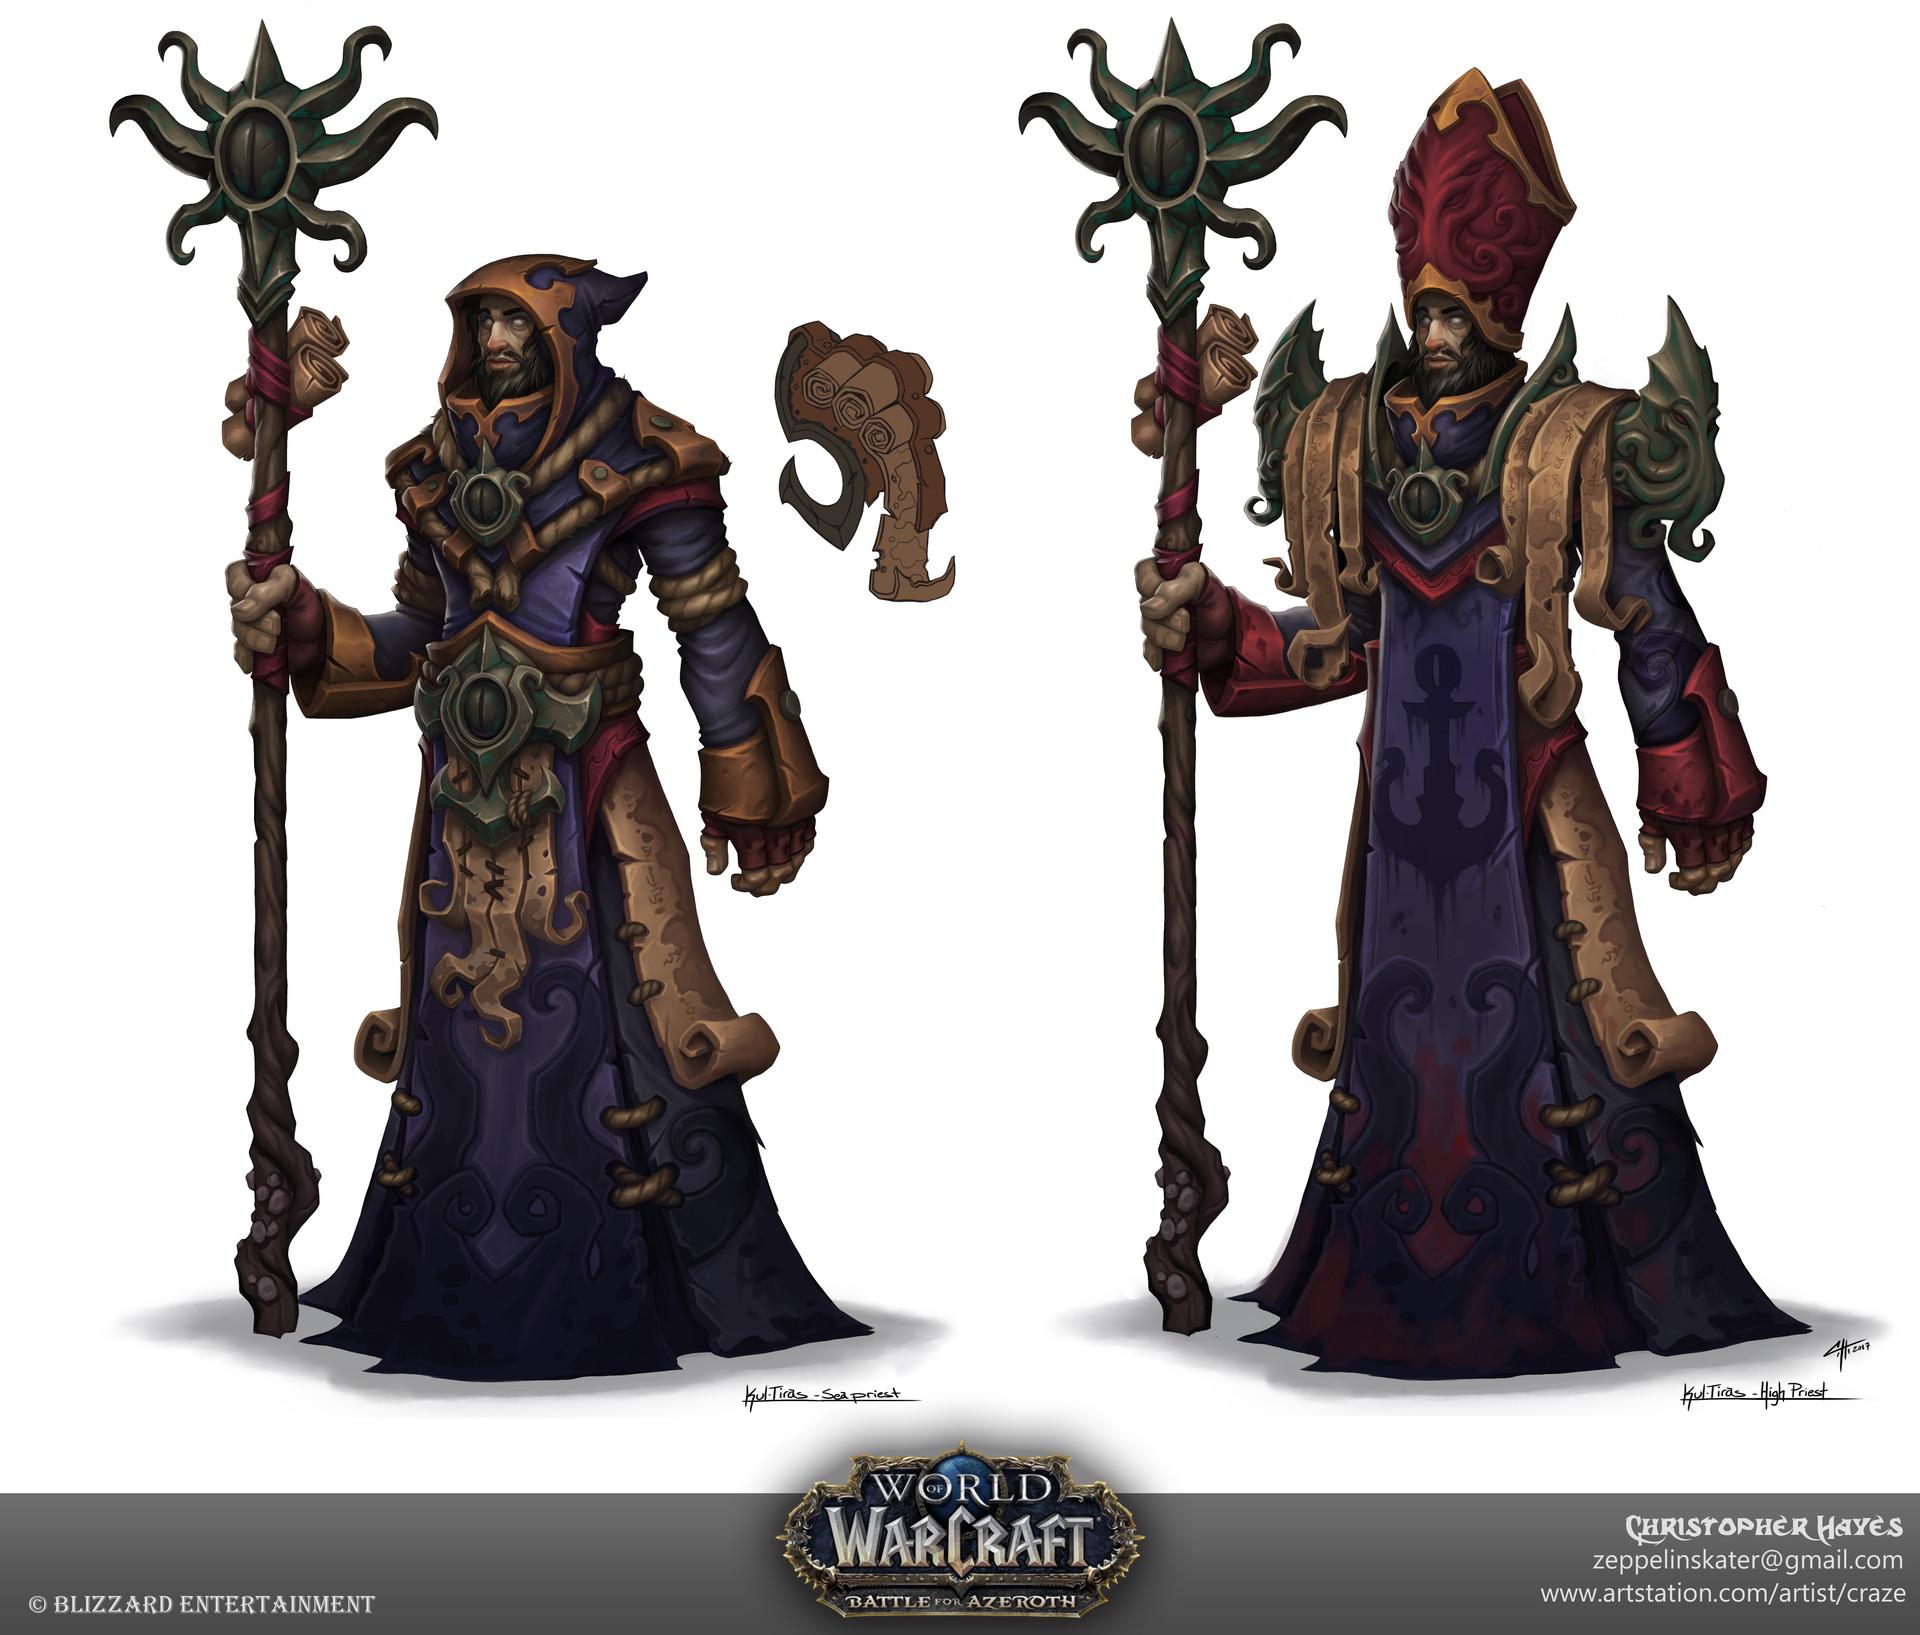 ArtStation - Sea Priest design for World of Warcraft ... Pictures Of Warcraft